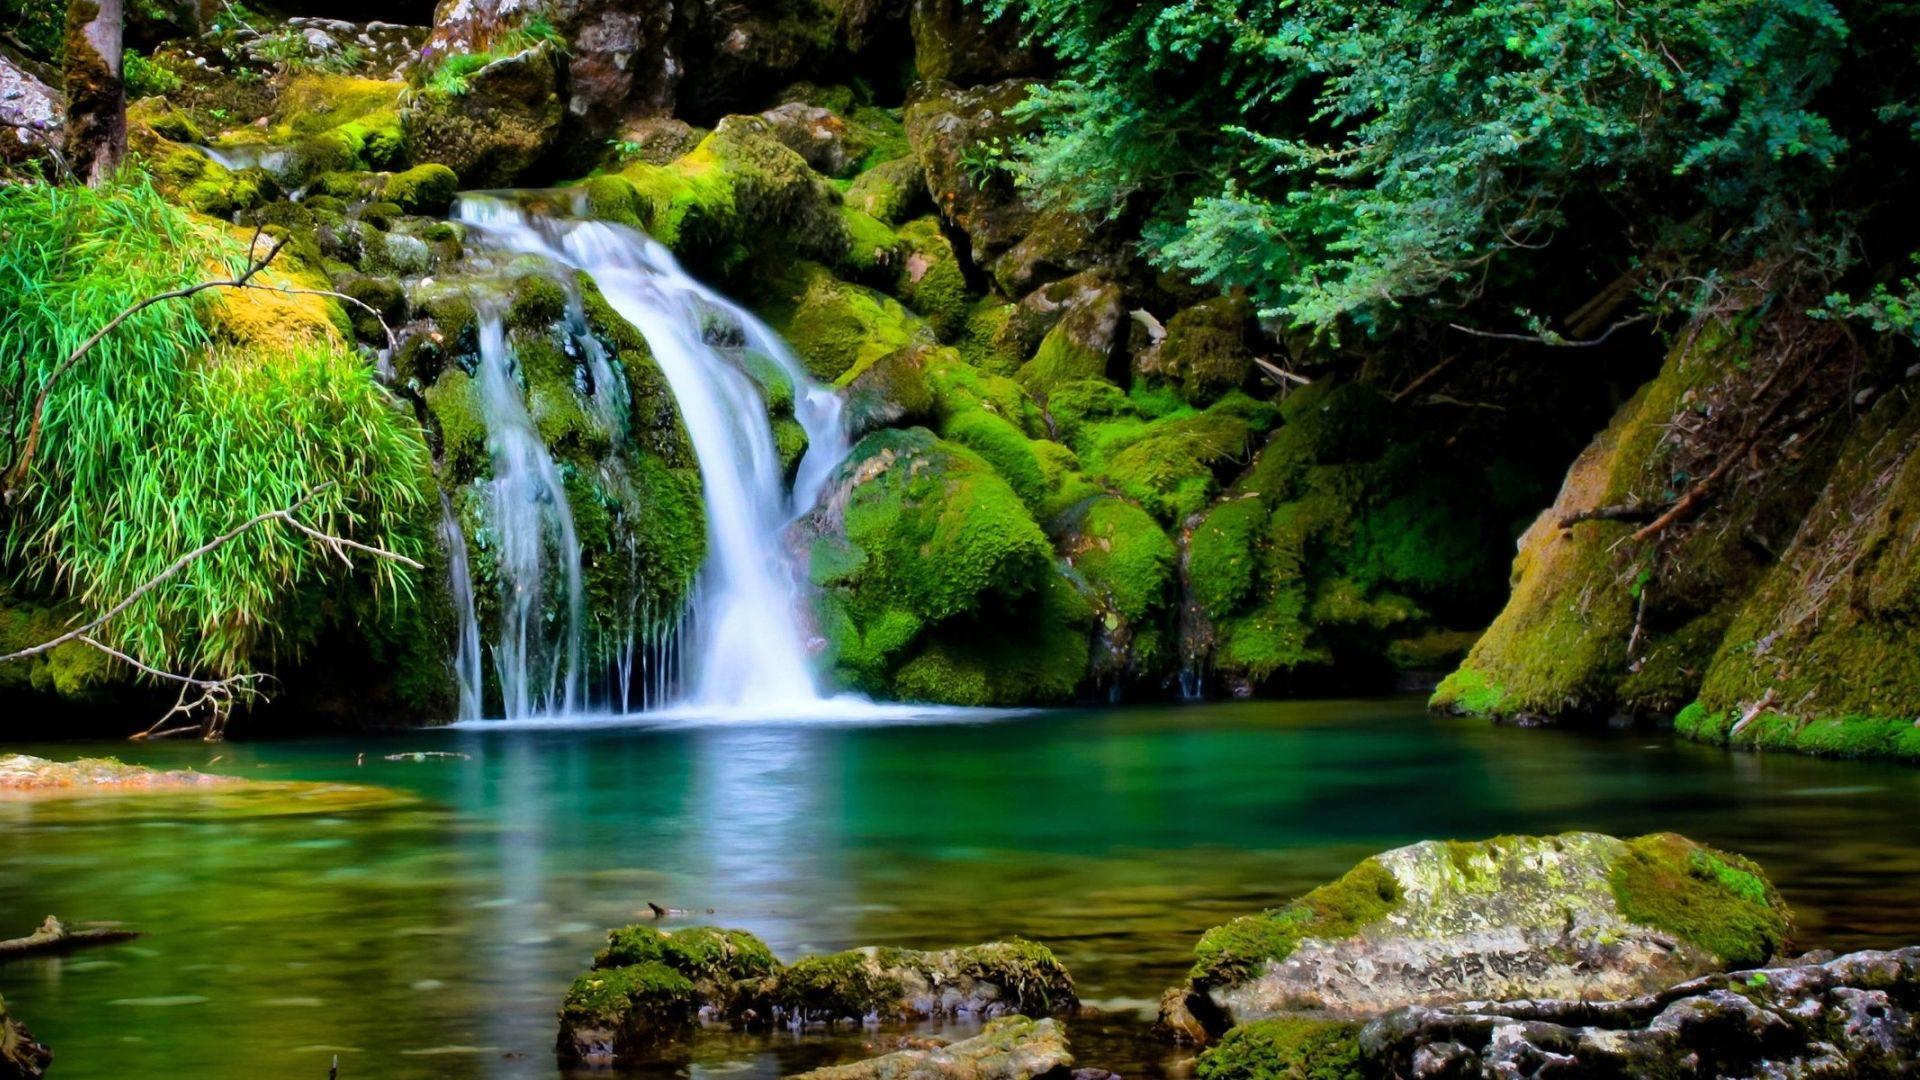 Desktop Wallpapers Waterfall On Mossy Rocks Wallpaper 851617 Waterfall Scenery Waterfall Wallpaper Waterfall Pictures